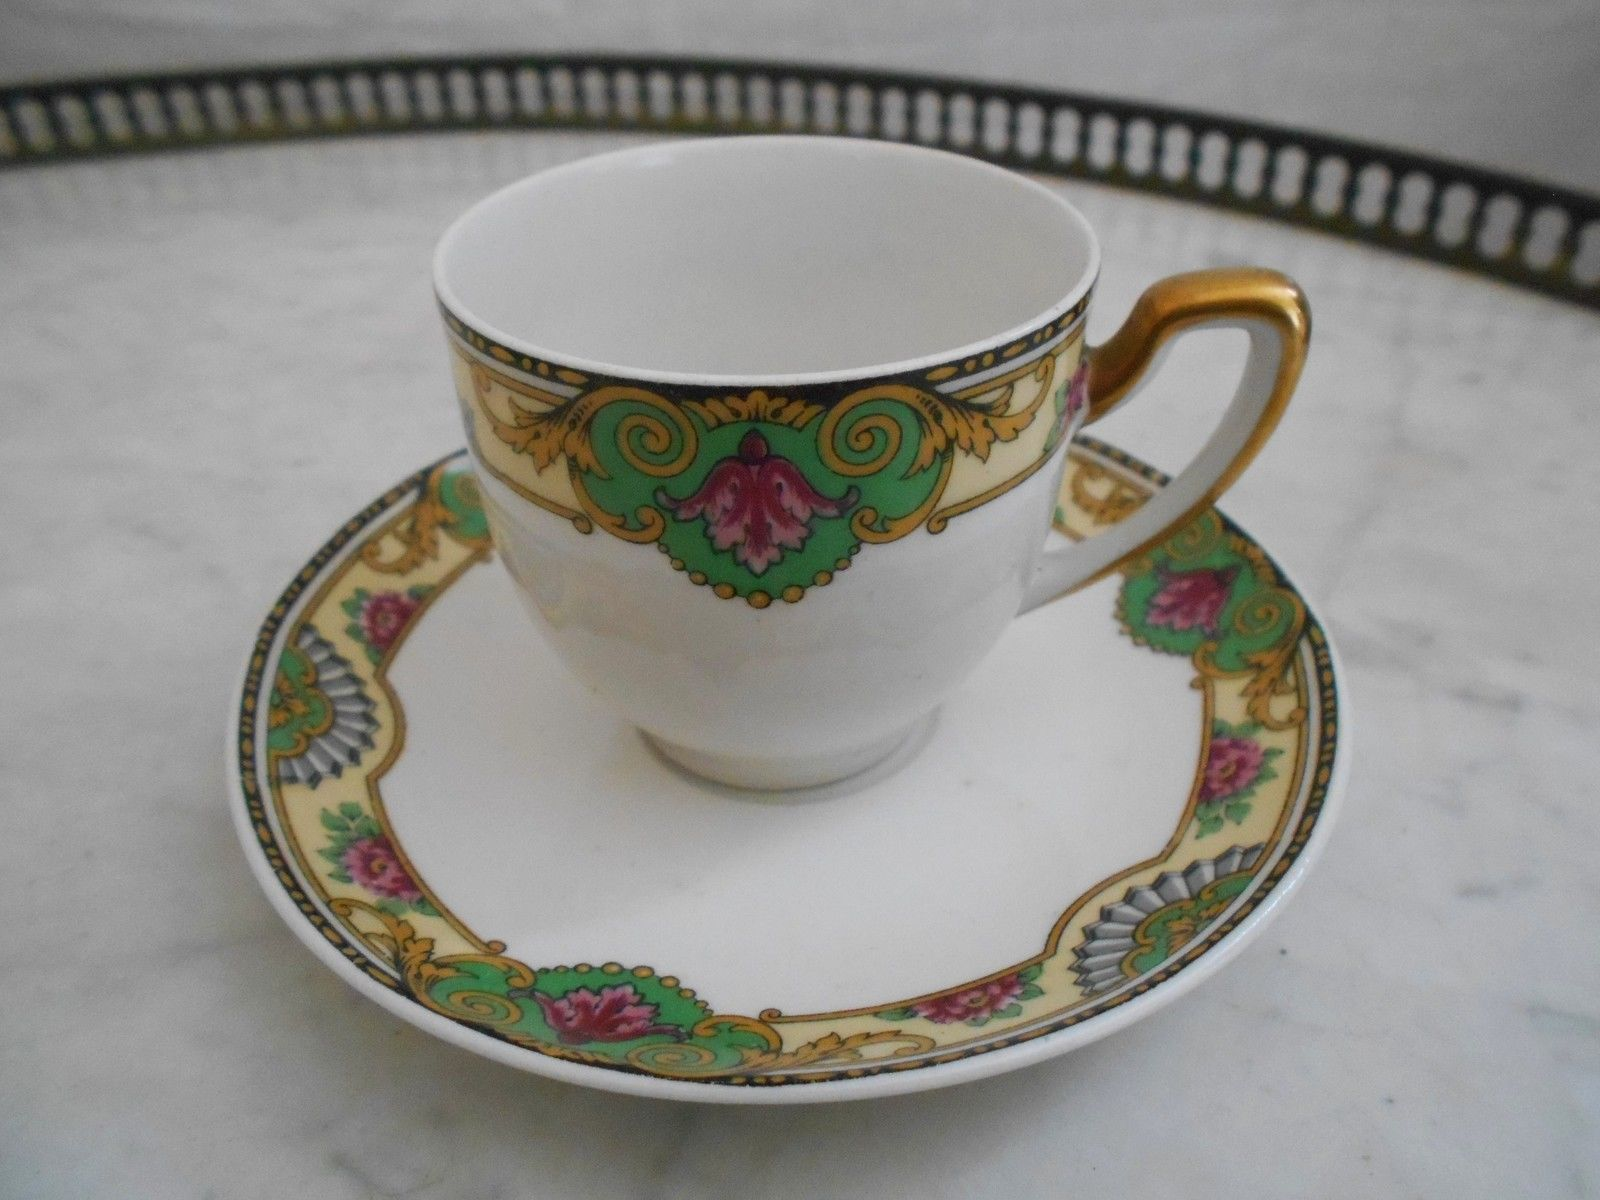 service de 4 tasse sous tasse a cafe the en porcelaine de limoges raynaud c ramiques. Black Bedroom Furniture Sets. Home Design Ideas